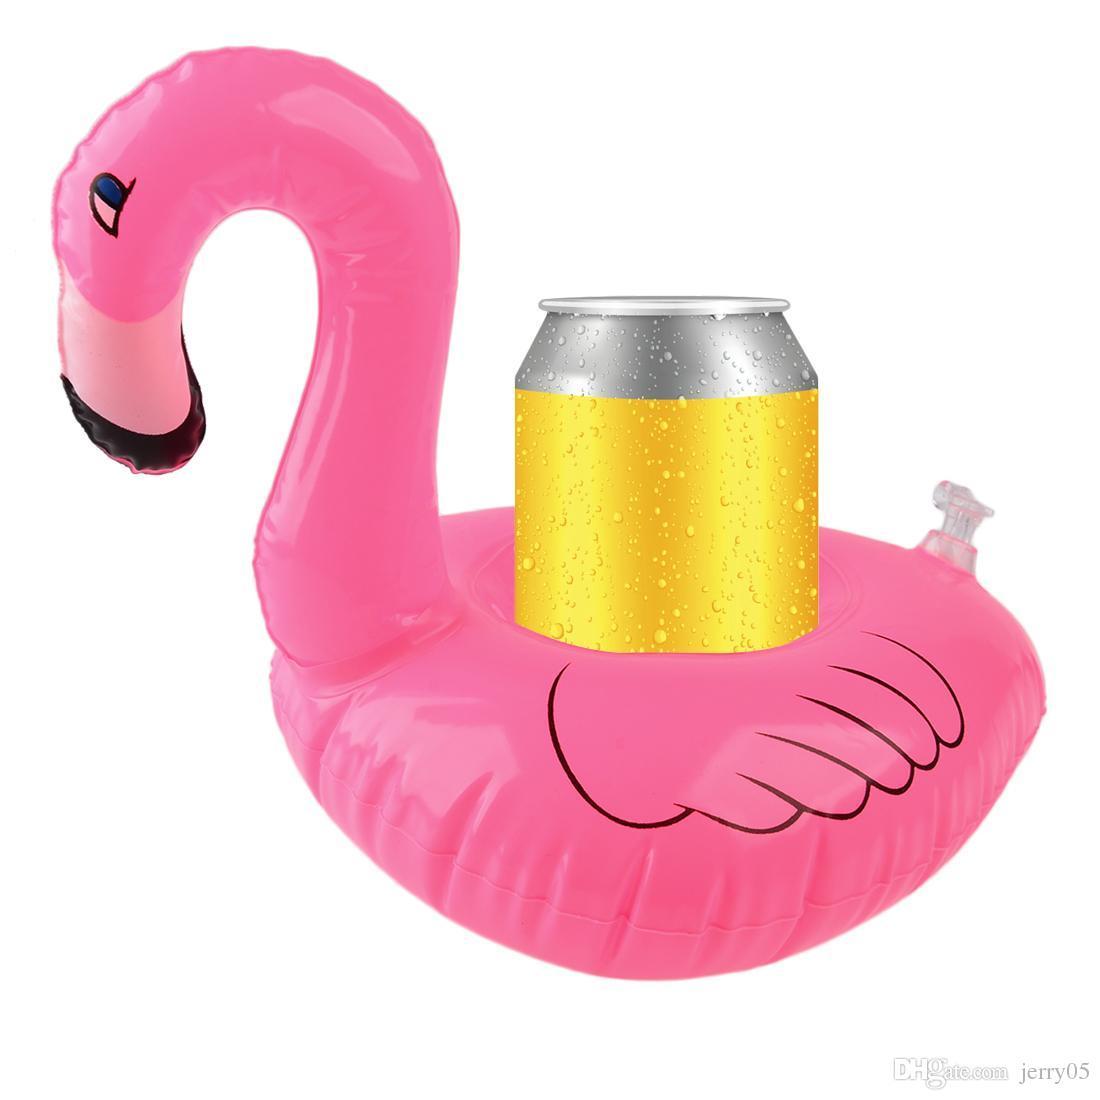 2 Unids / set Flotante Mini Flamingo Piscina Flotante Portabotellas Inflable Teléfono Celular / Puede Coca-Cola Copa Bebida Sostenedor de Natación